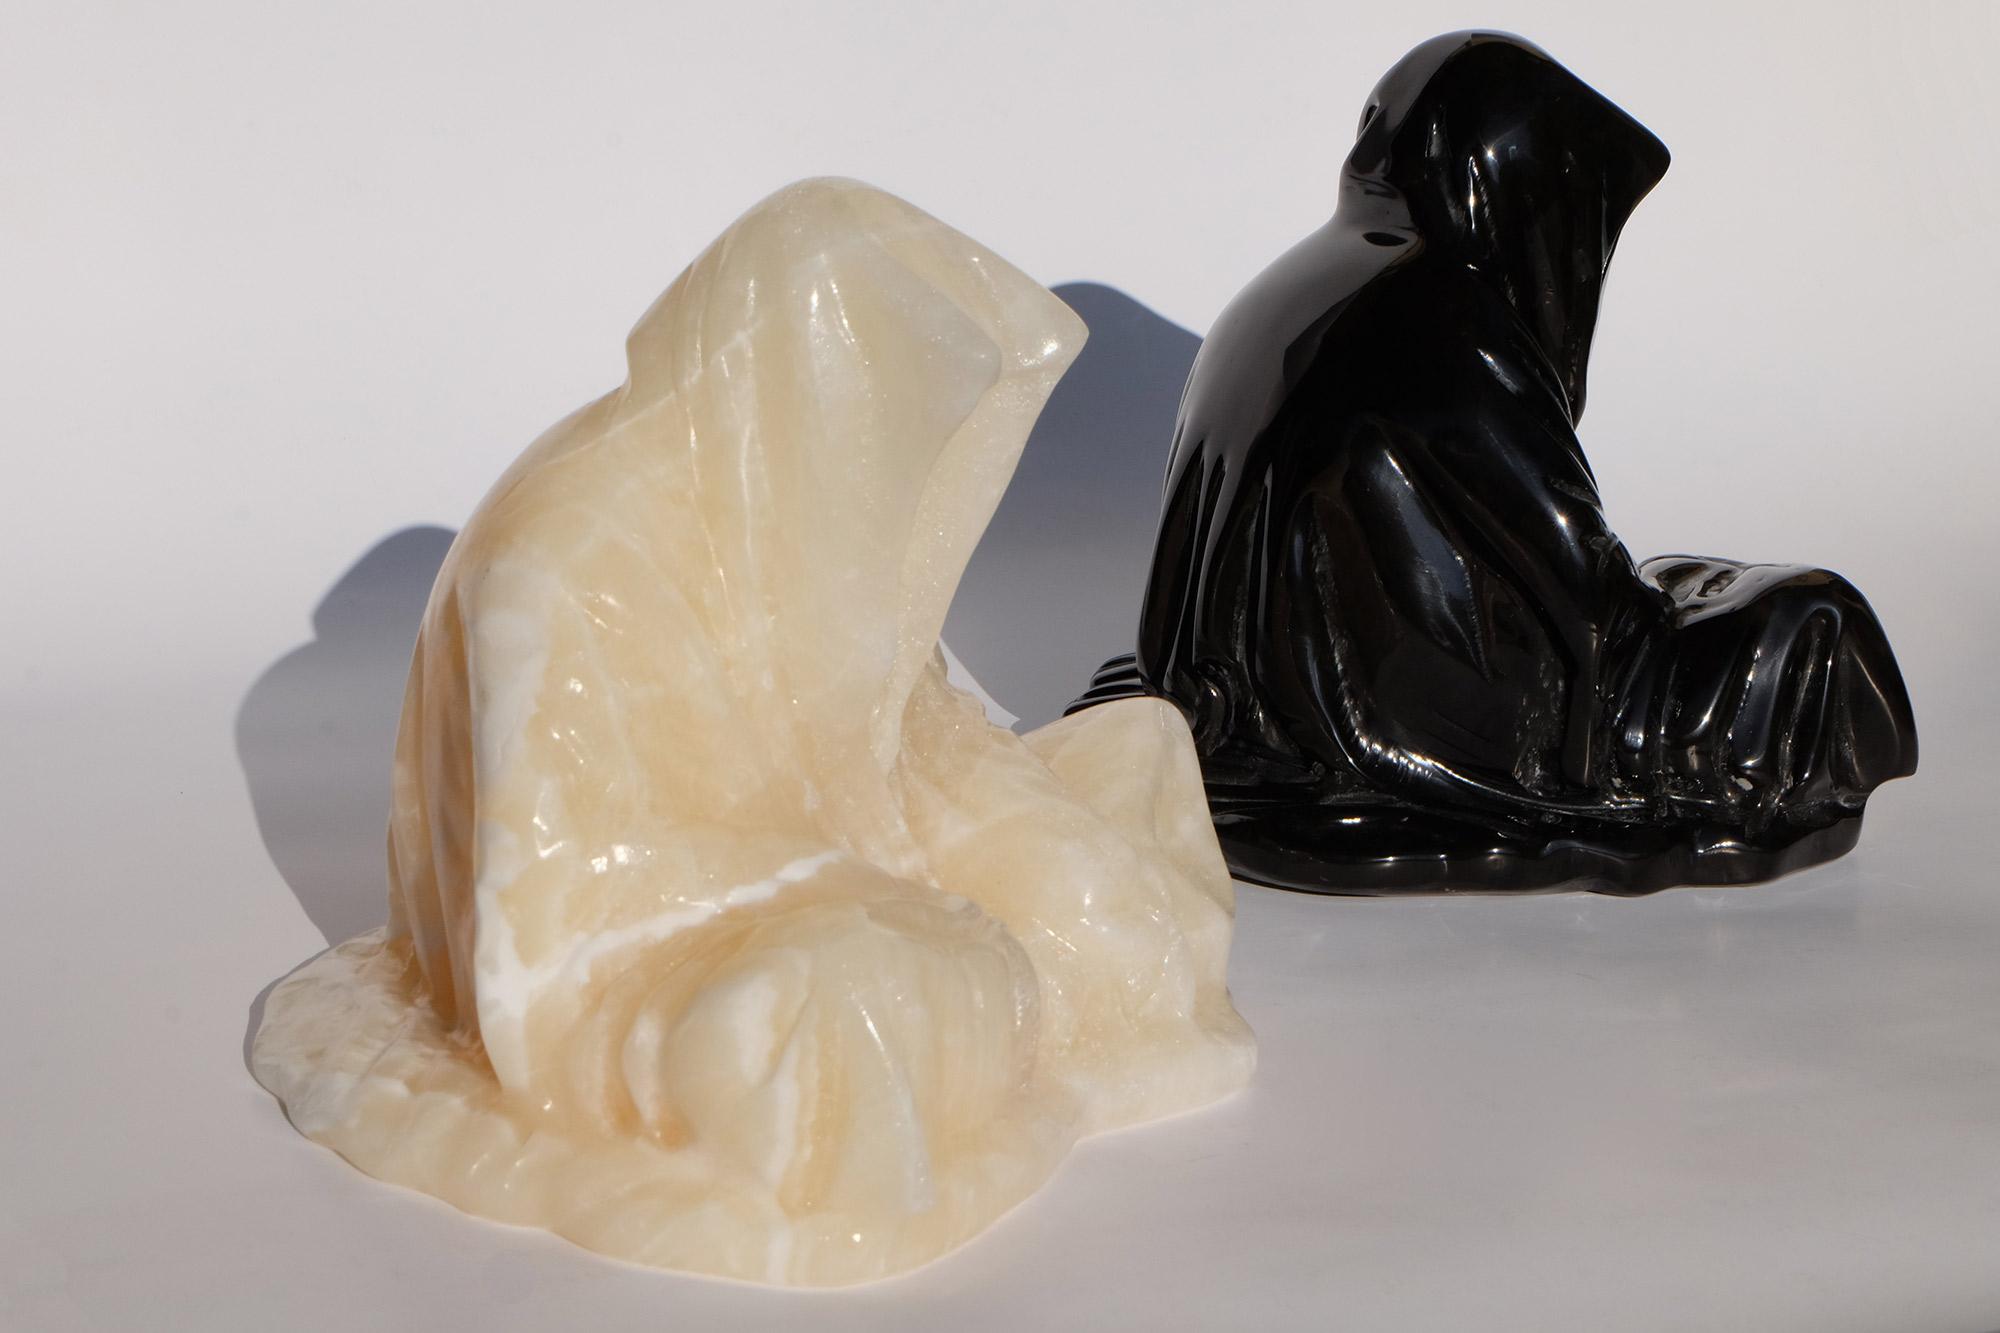 onyx-marble-stone-rock-guardians-of-time-manfred-kielnhofer-contemporary-art-modern-arts-fine-art-design-sculpture-statue-show-gallery-3907a